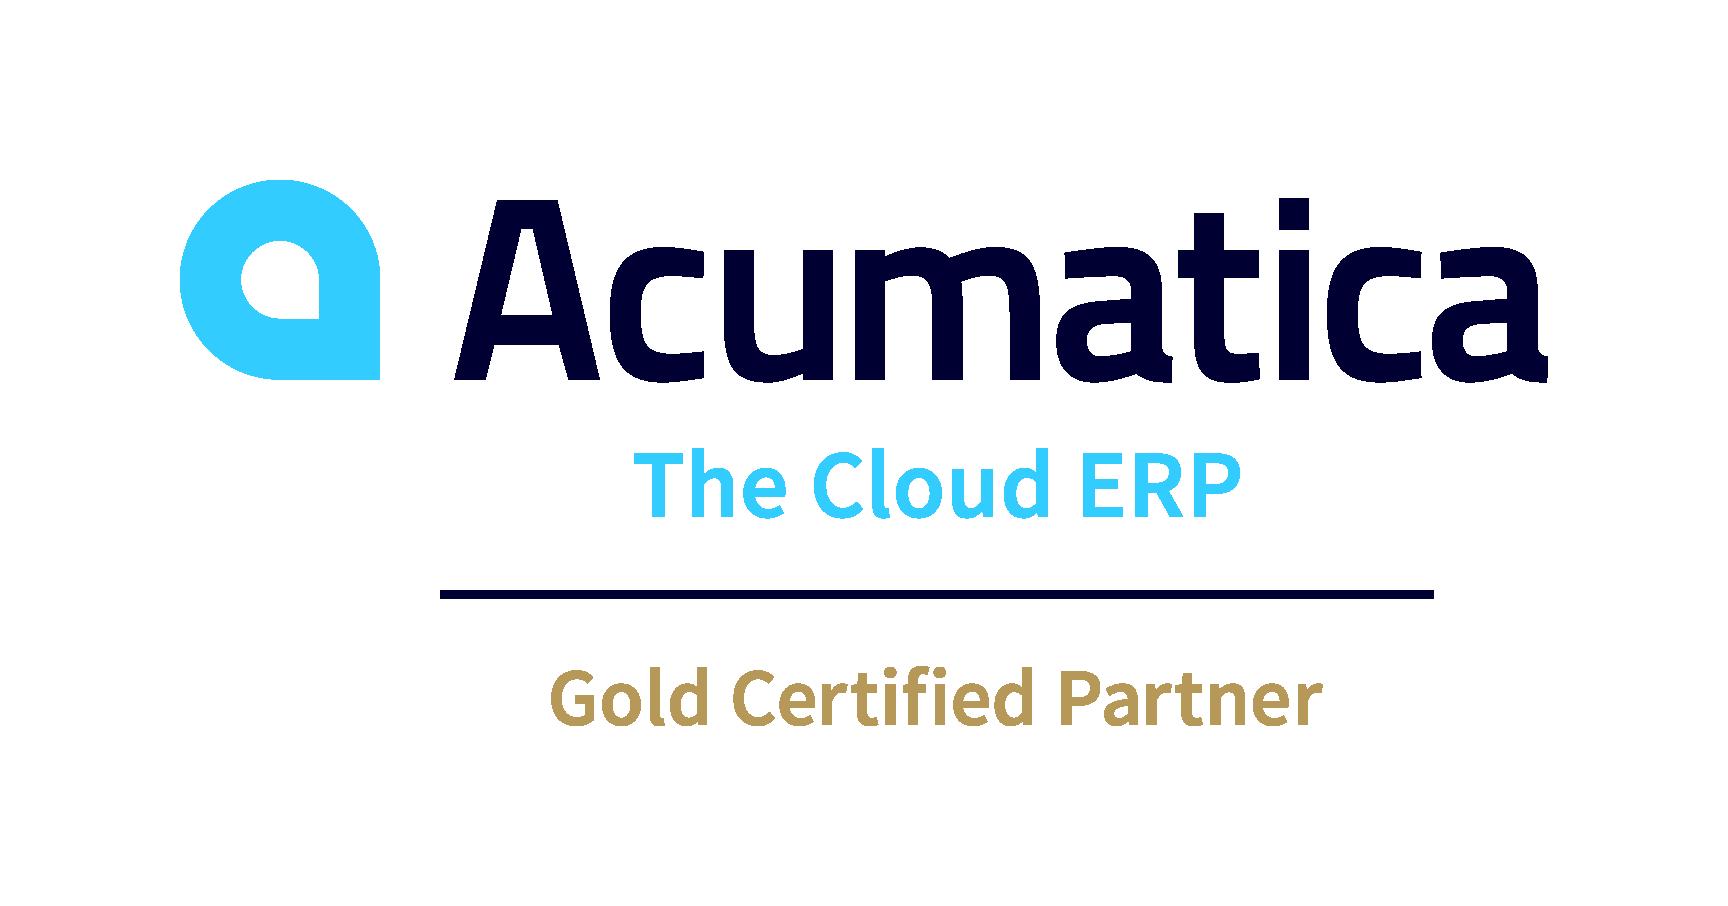 Gold Certified Acumatica Partner